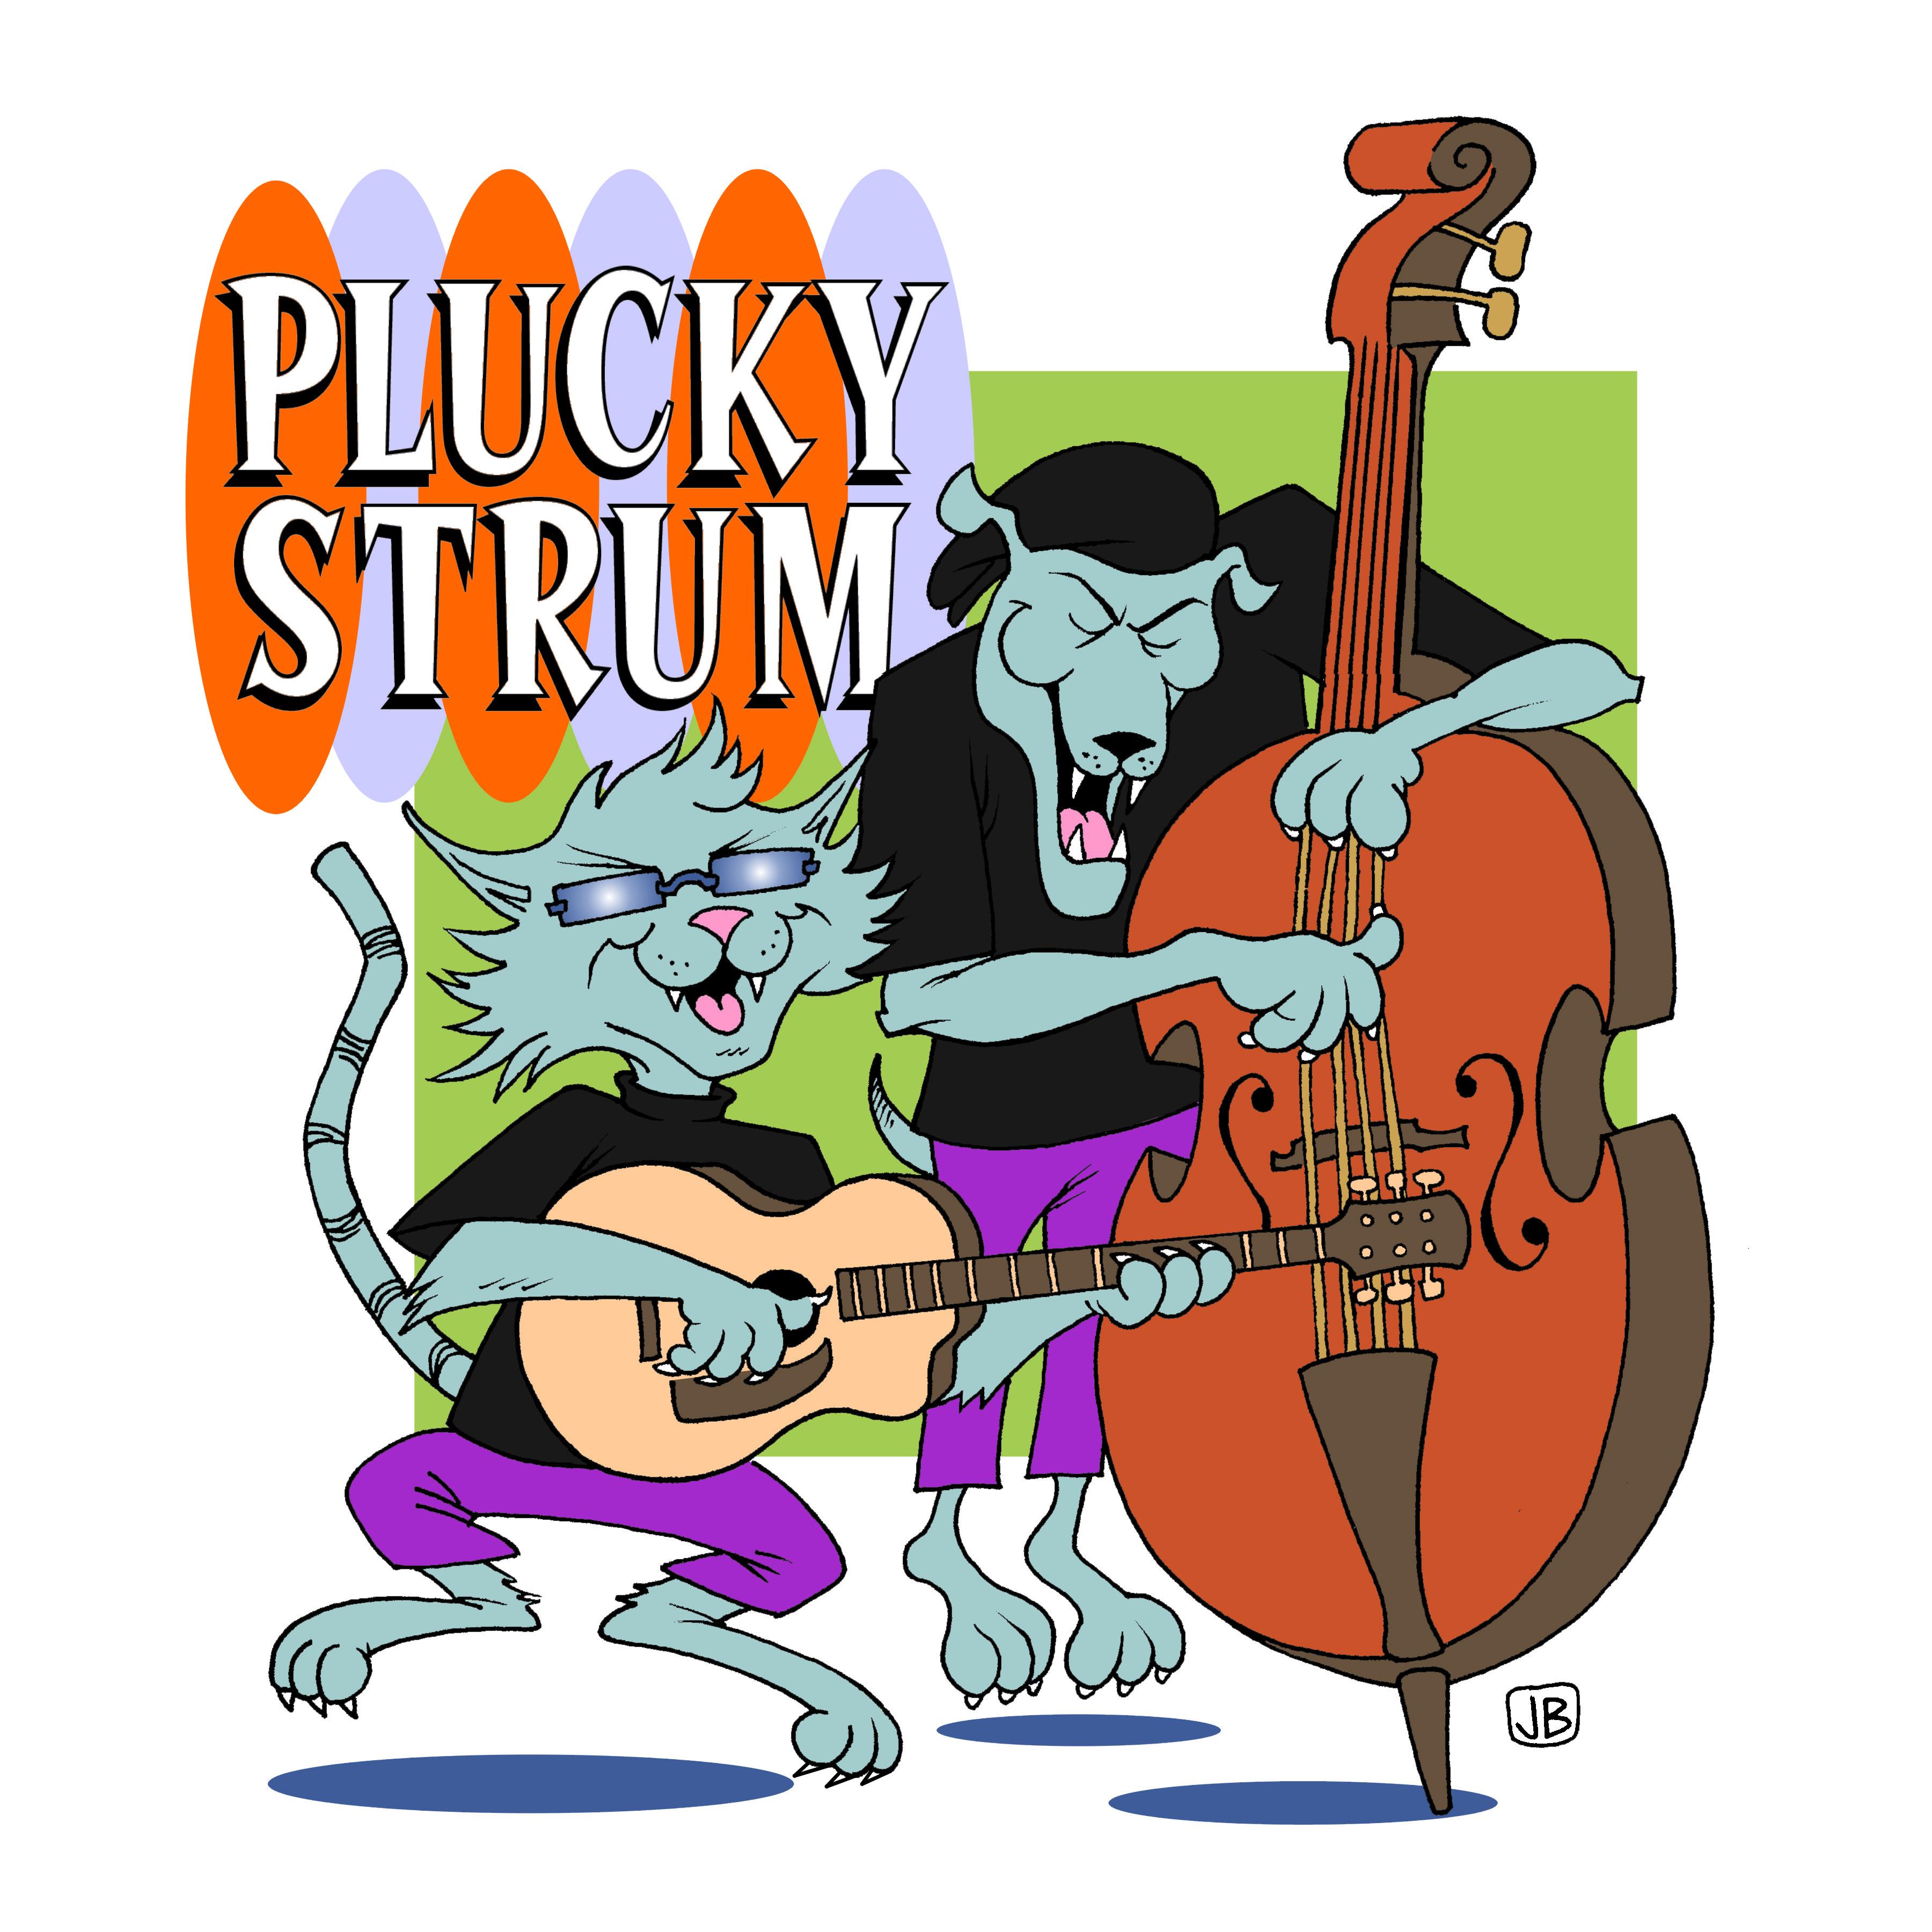 Plucky Strum Live